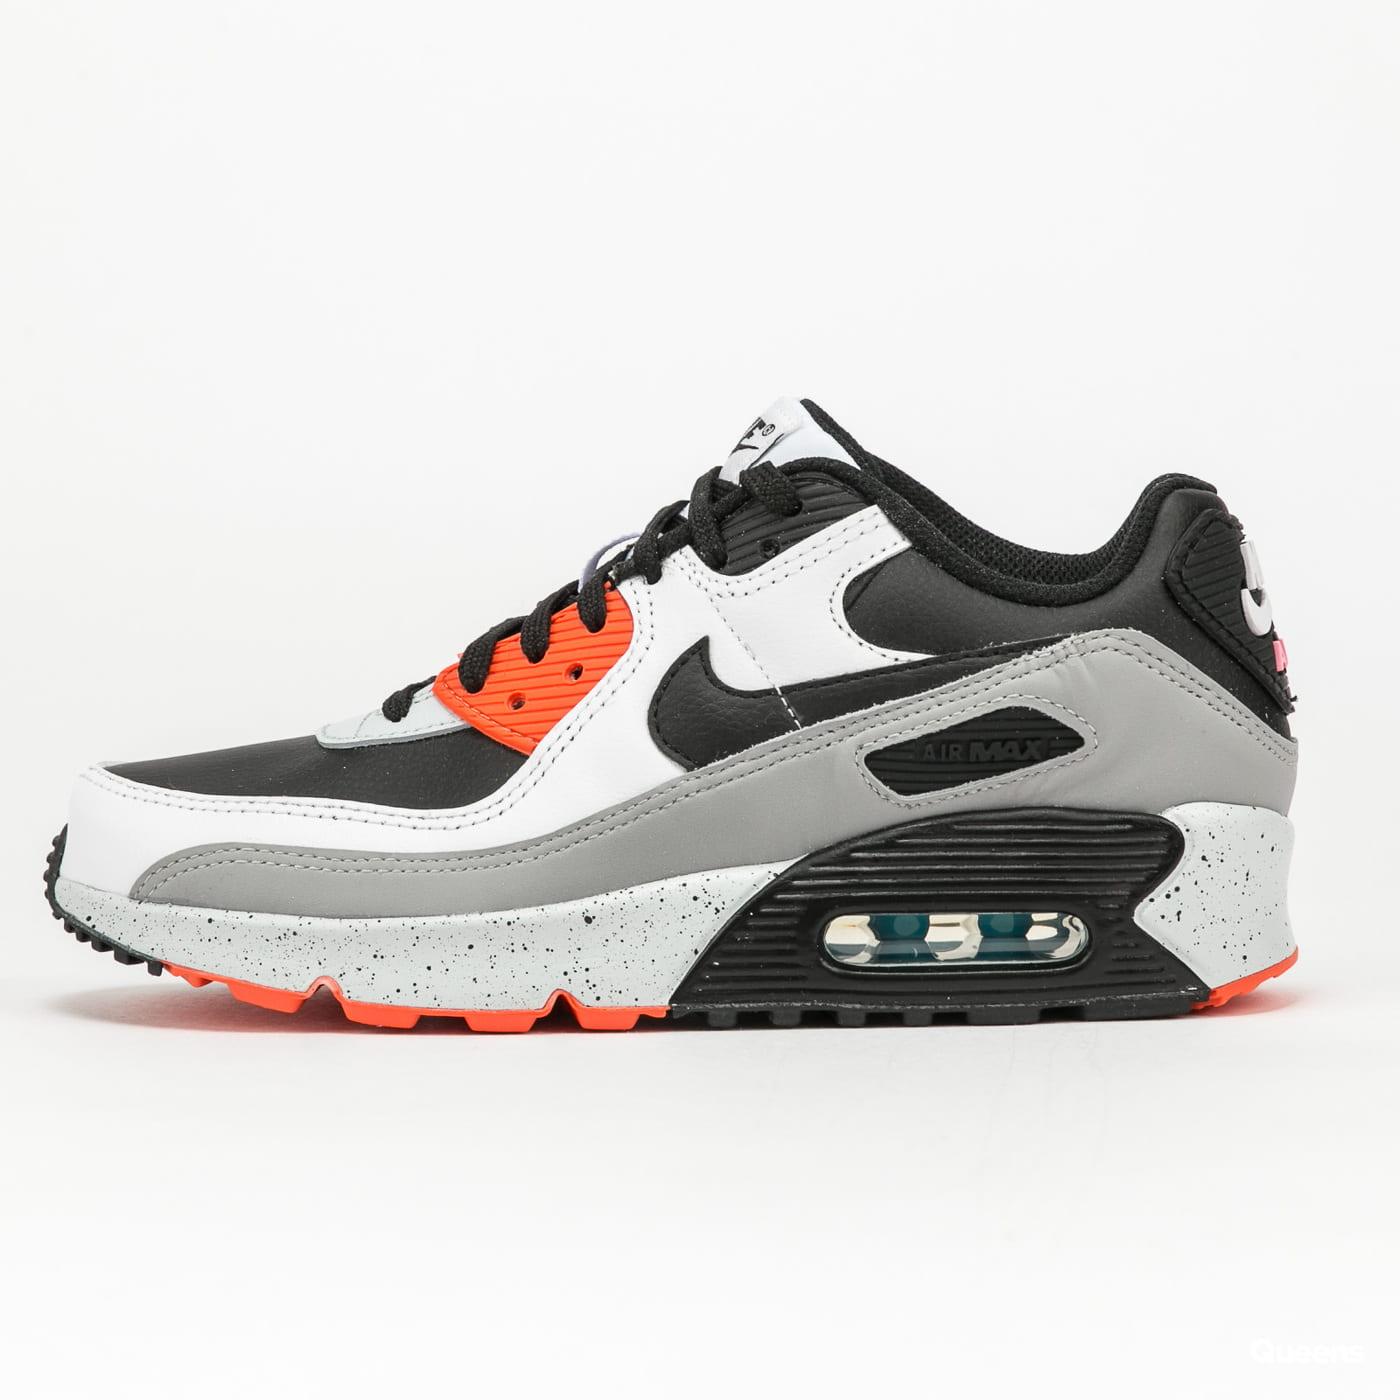 Nike Air Max 90 Leather (GS) white / black - turf orange